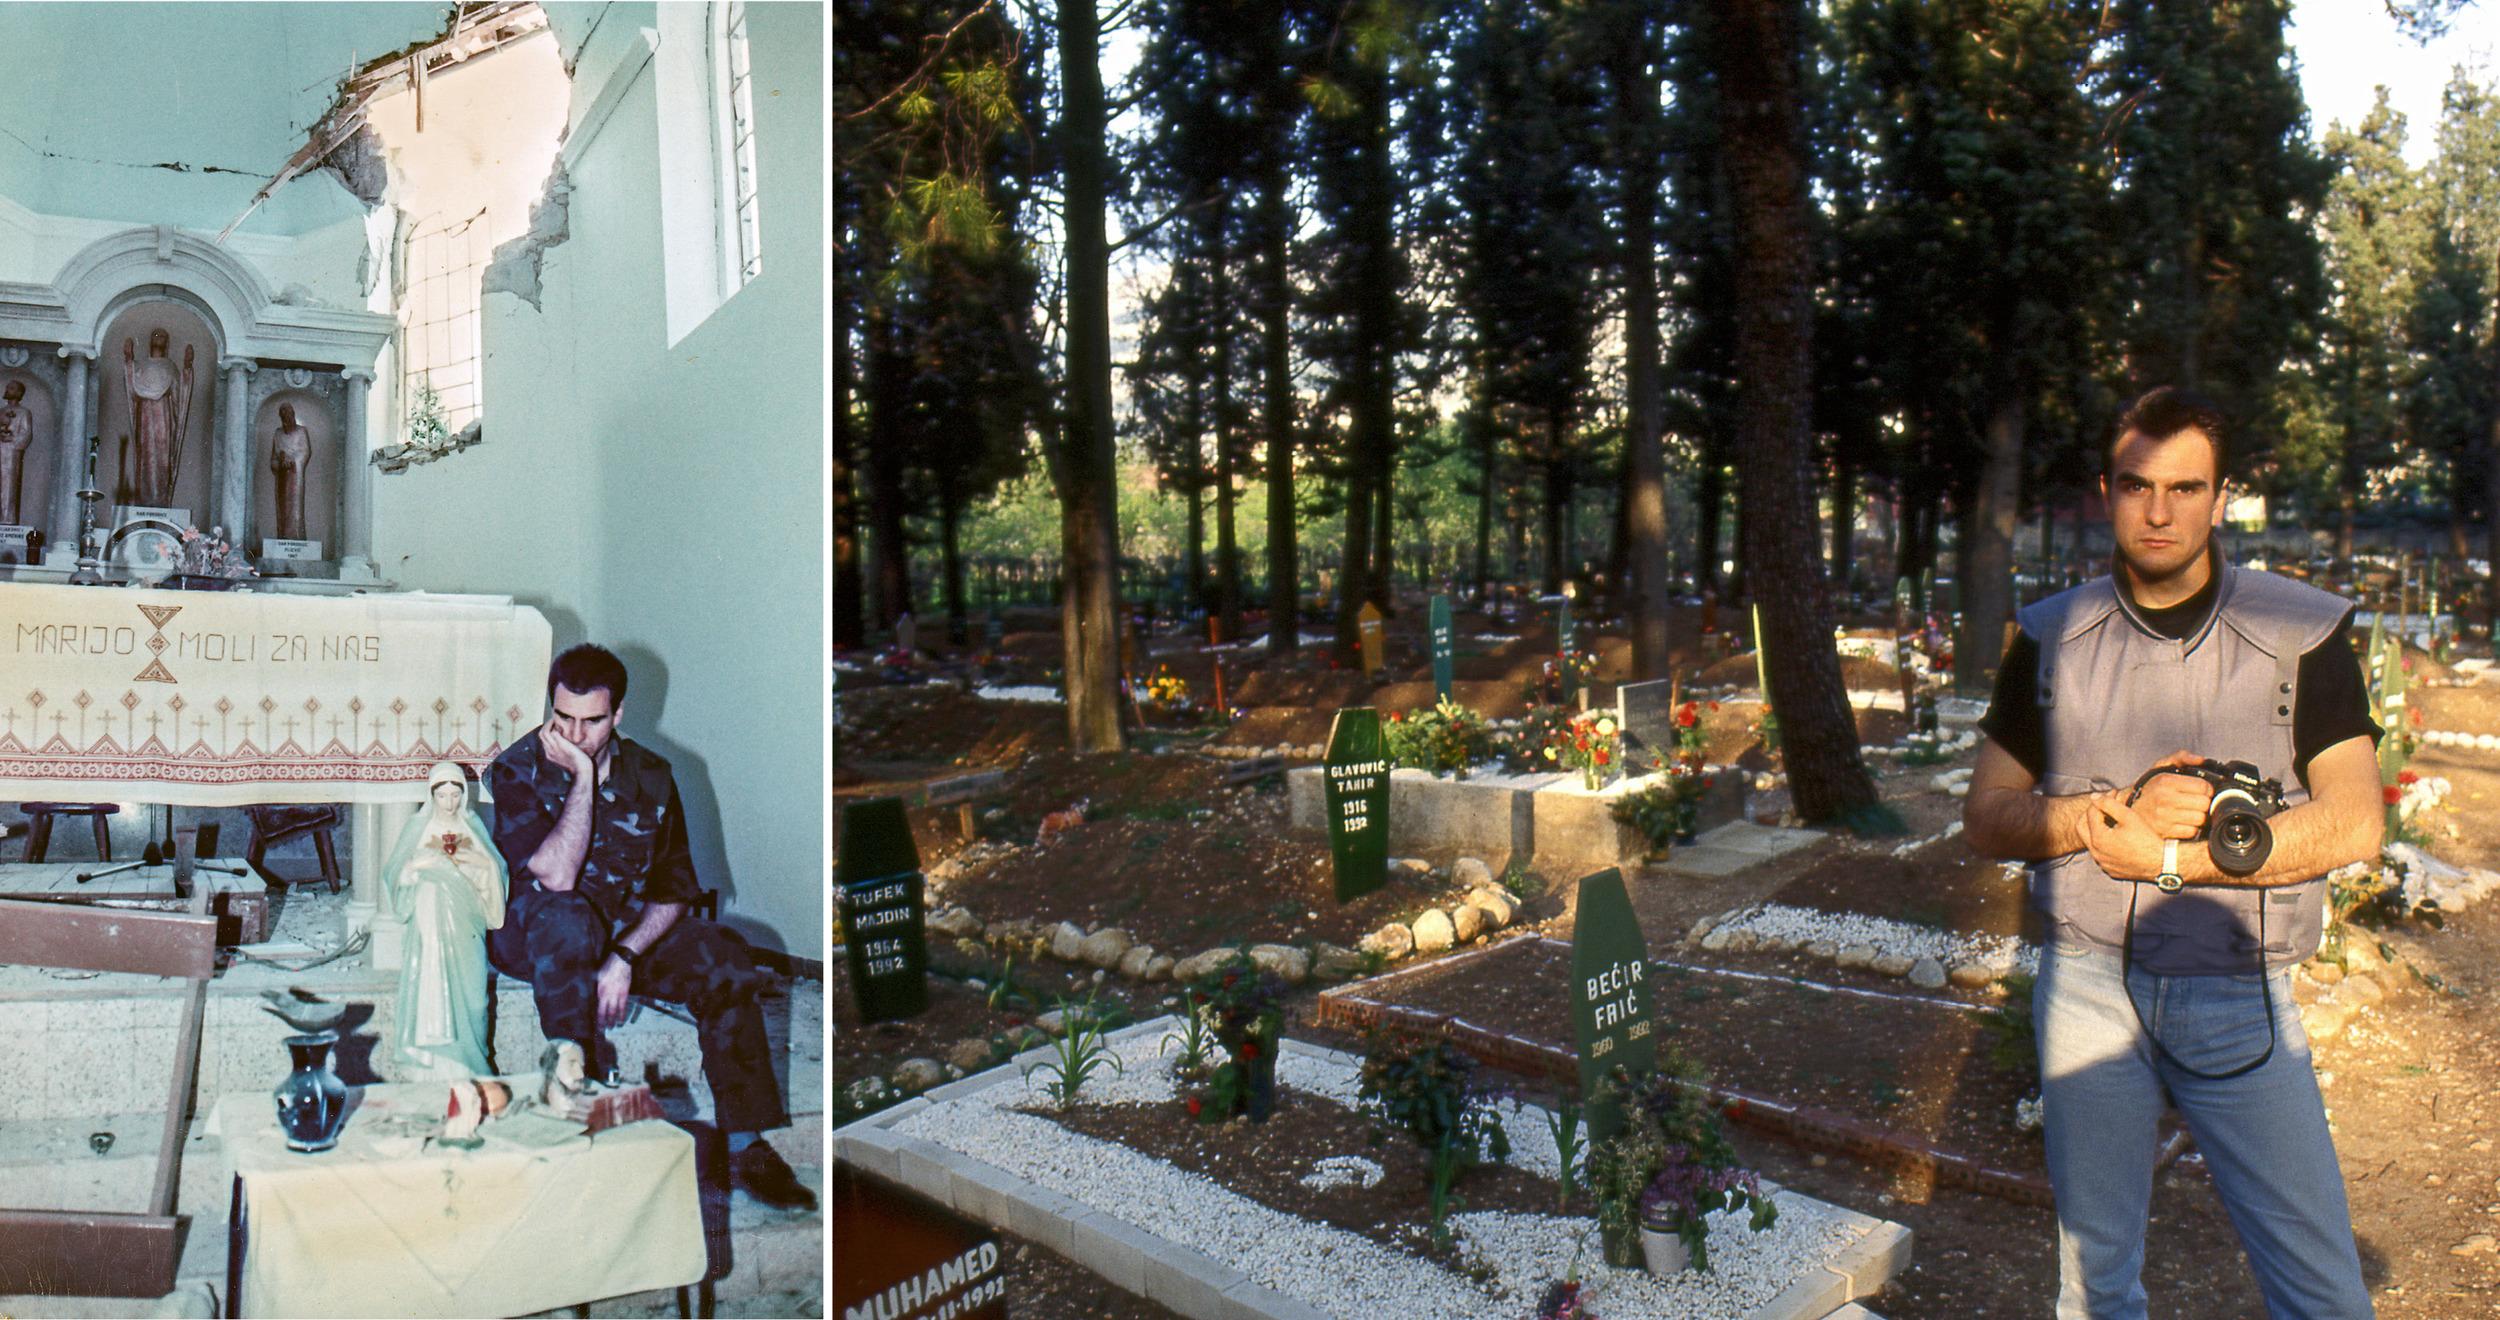 In shelled Church during the war in Croatia. The war in Bosnia, the Muslim cemetery.